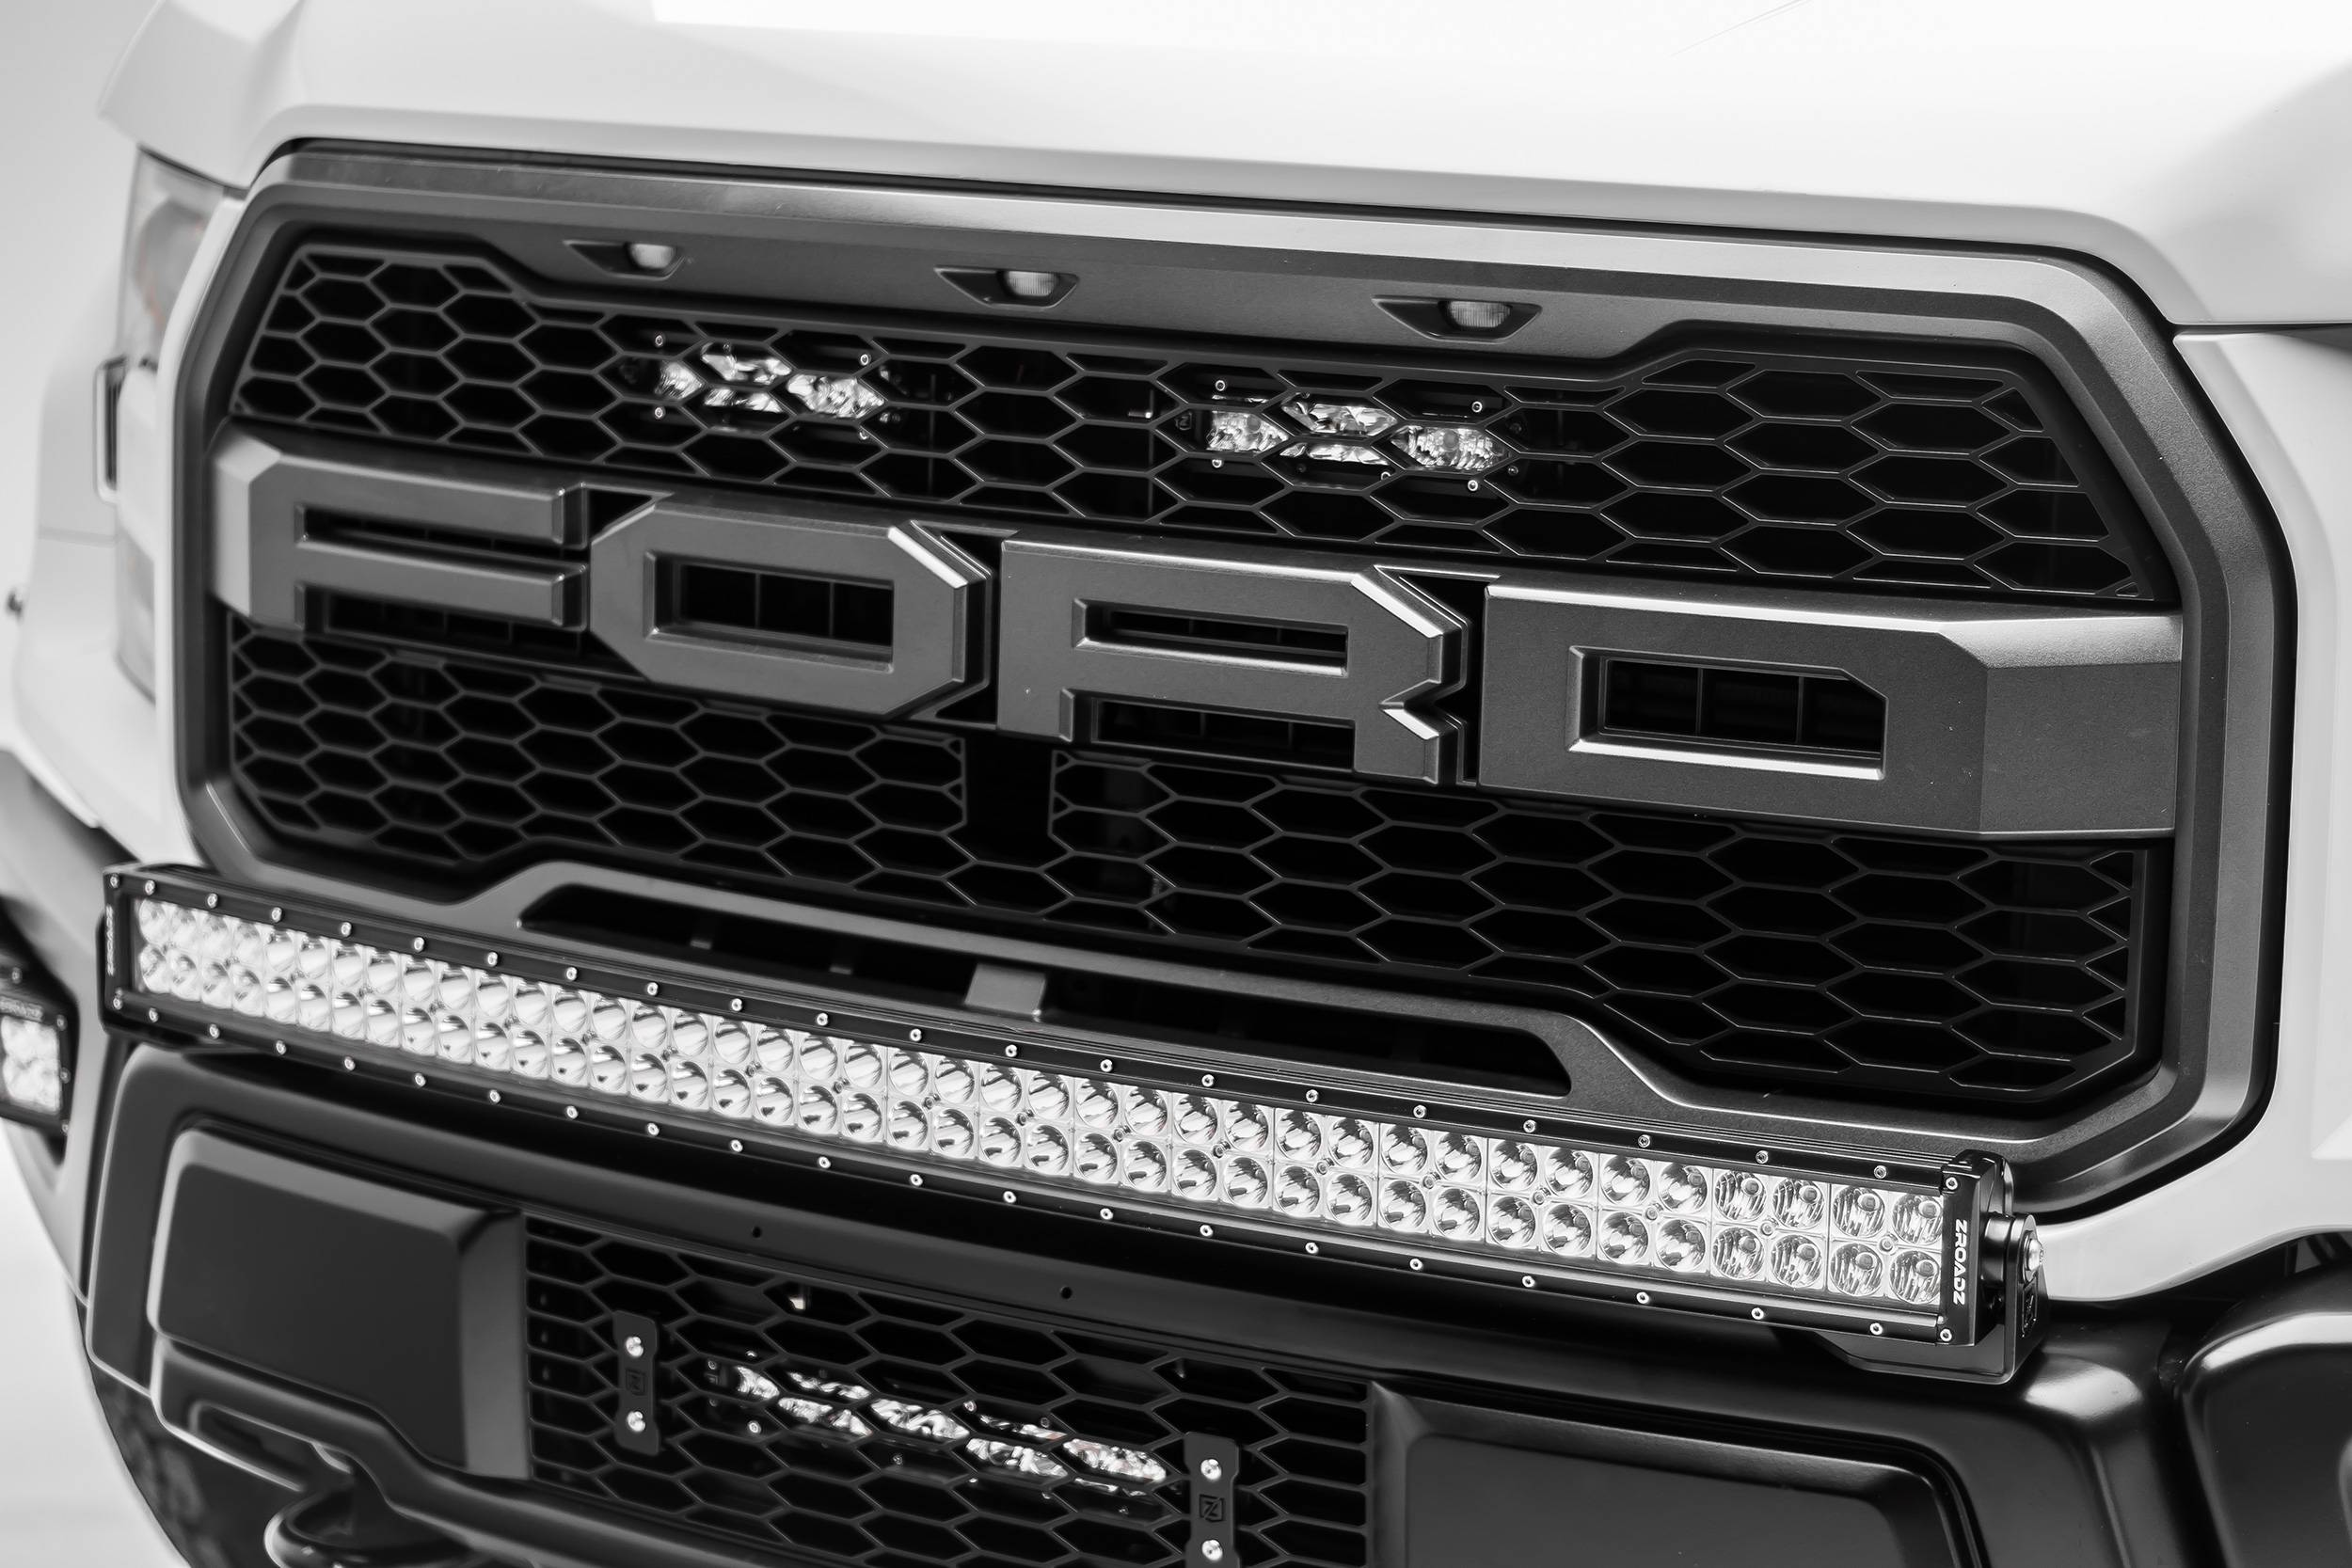 2017-2019 Ford F-150 Raptor OEM Grille LED Kit, Incl. (2) 6 Inch LED Straight Single Row Slim Light Bars - PN #Z415651-KIT